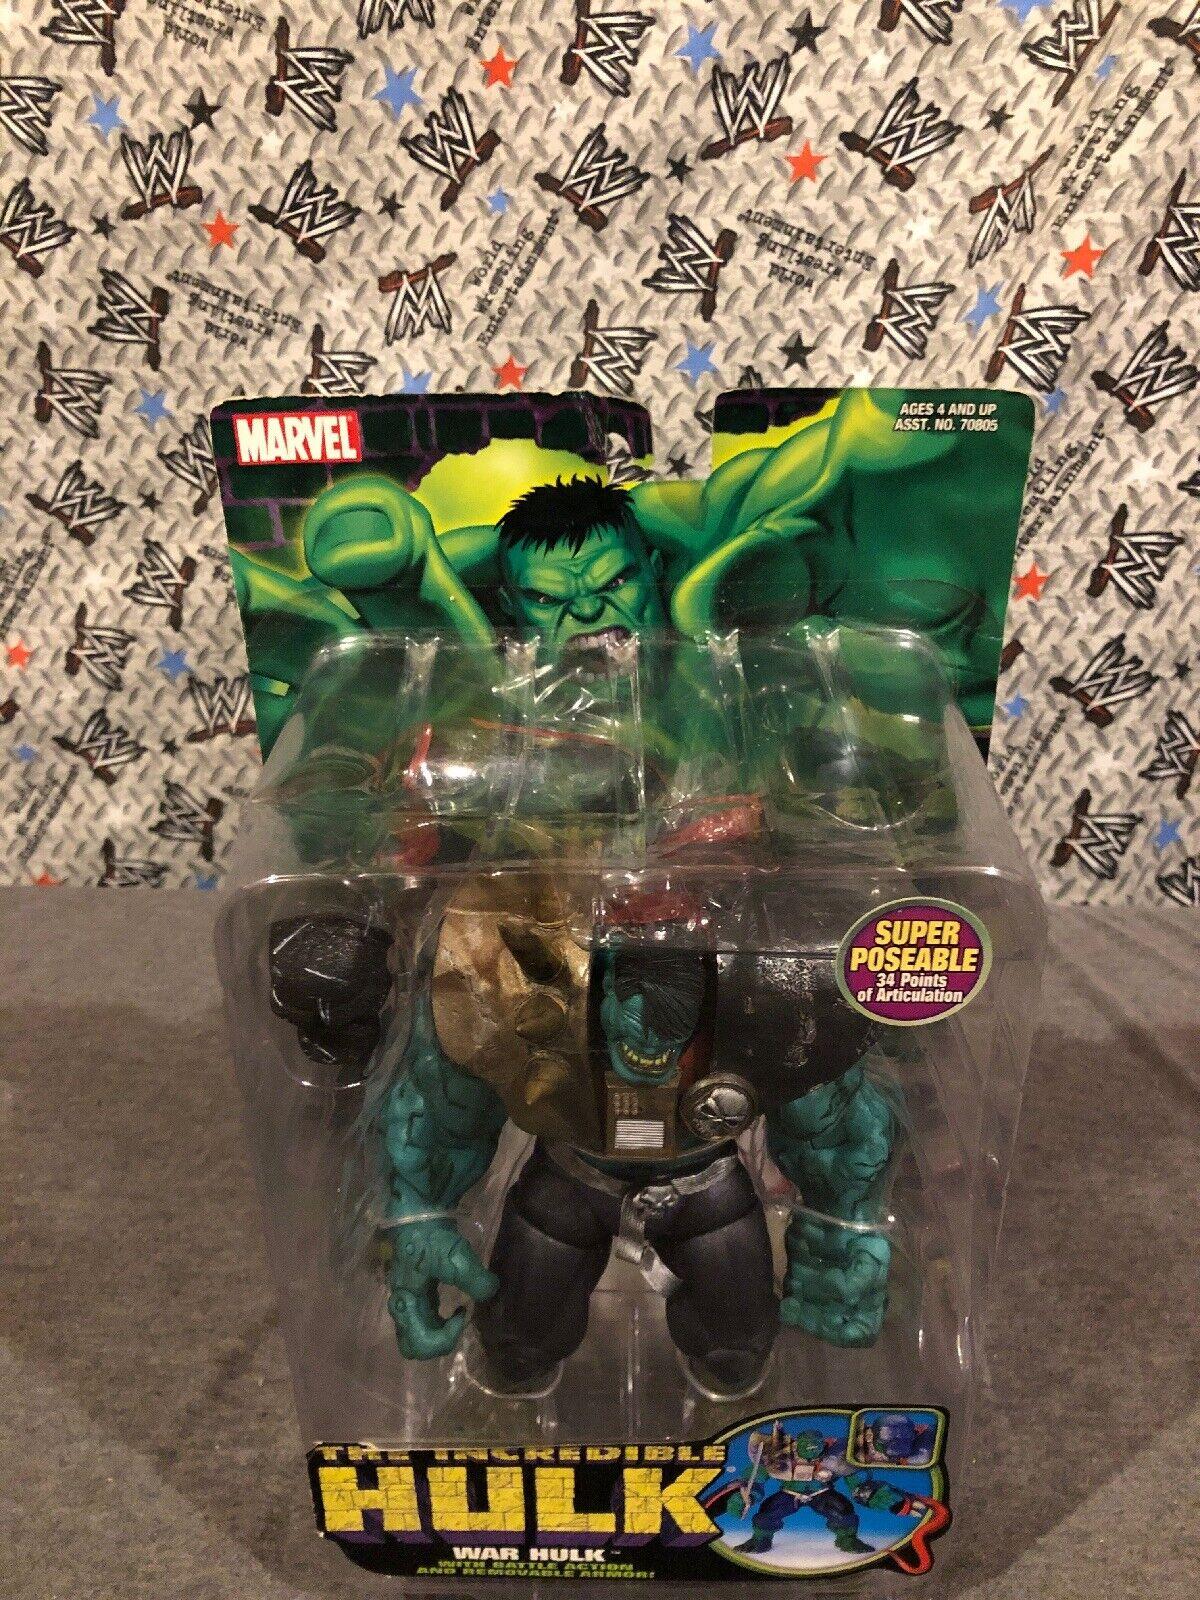 Marvel Legends giocattolobiz Hulk classeics War Hulk azione cifra cifra cifra nuovo EXTREMELY RARE 127369